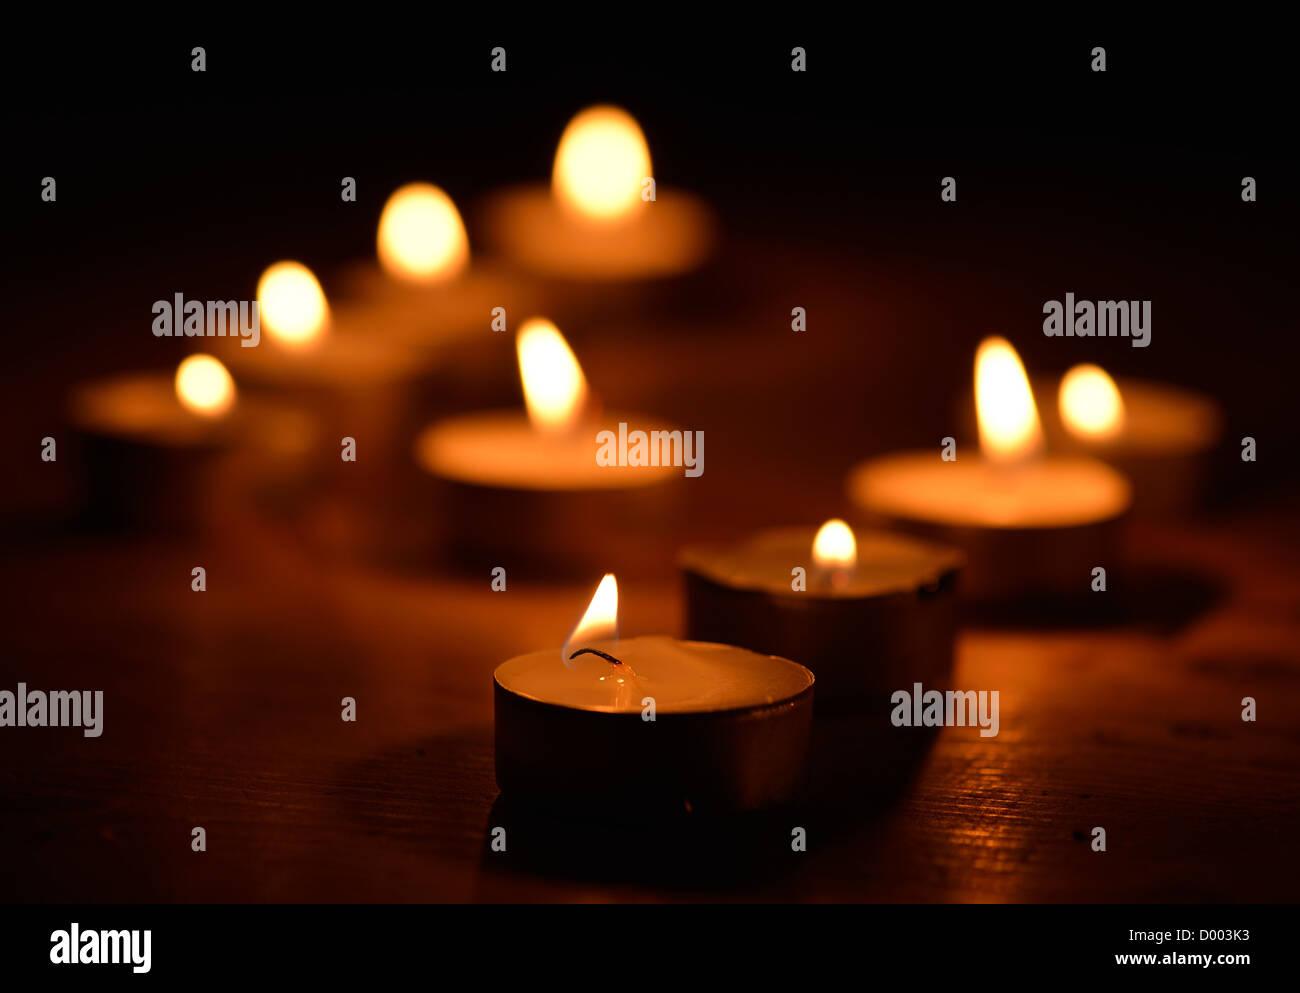 candlelight - Stock Image